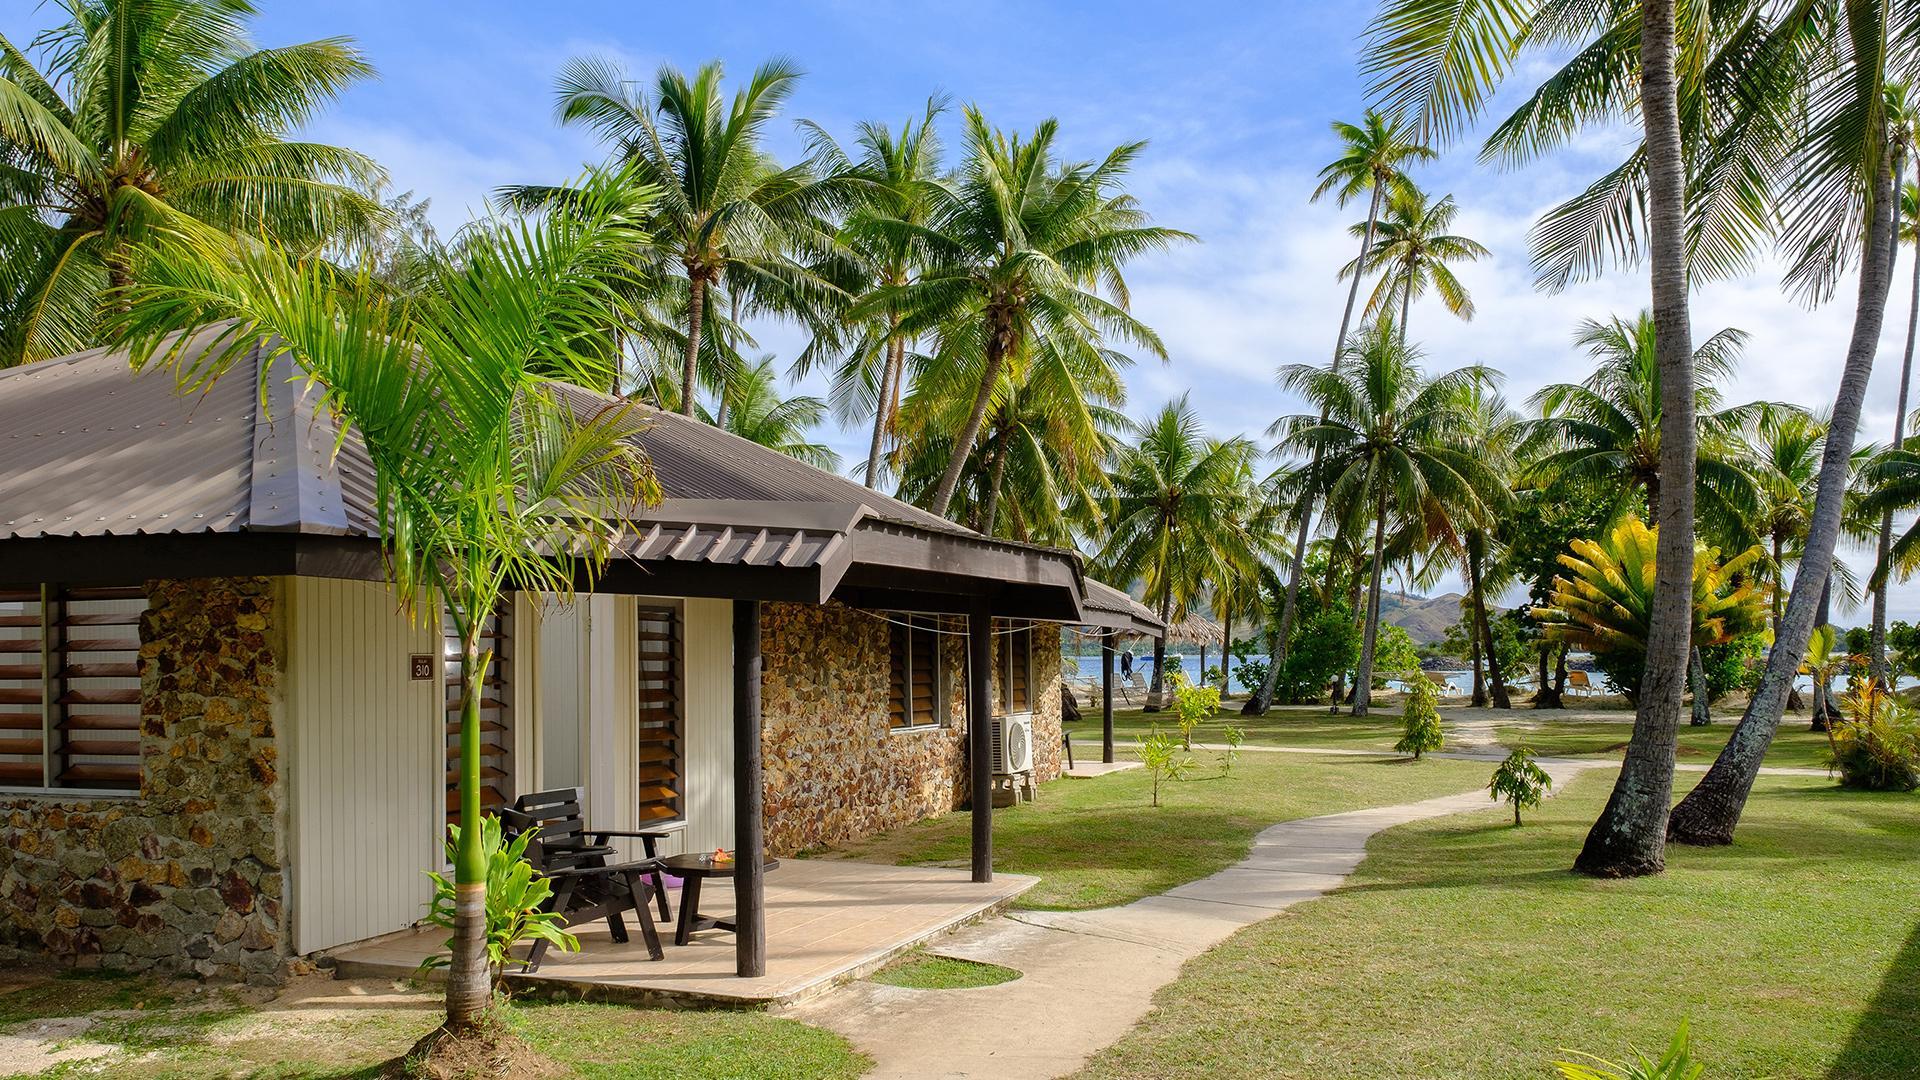 Studio Garden Bure image 1 at Plantation Island Resort by null, Western Division, Fiji